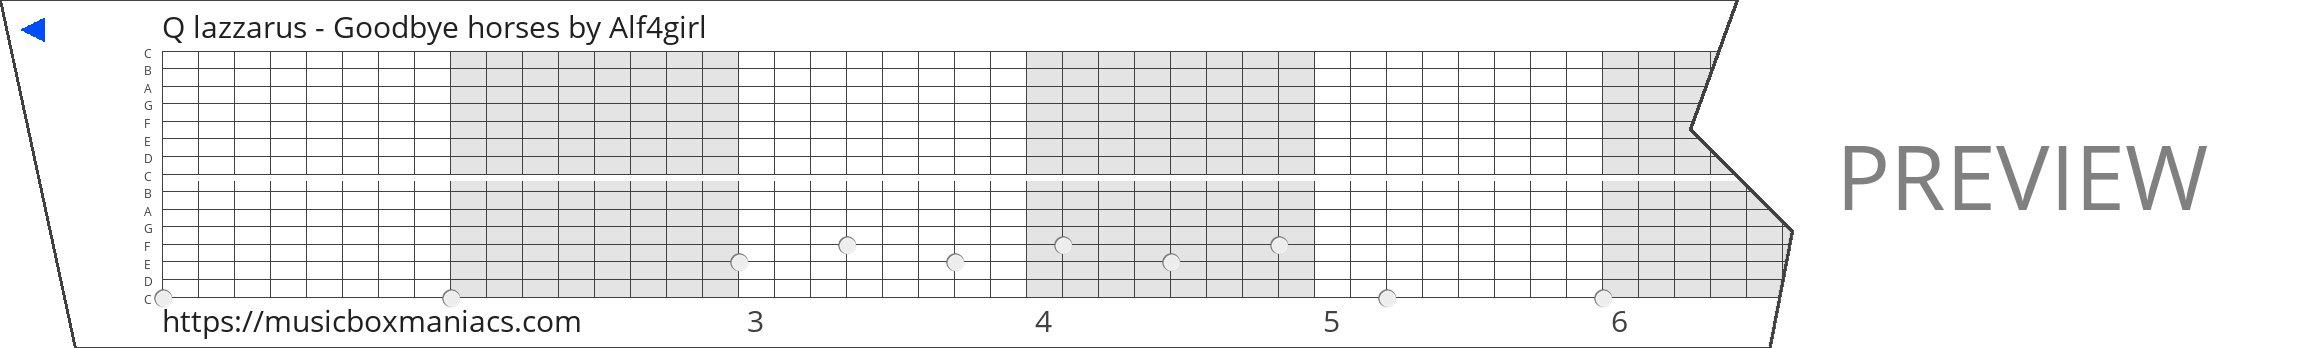 Q lazzarus - Goodbye horses 15 note music box paper strip